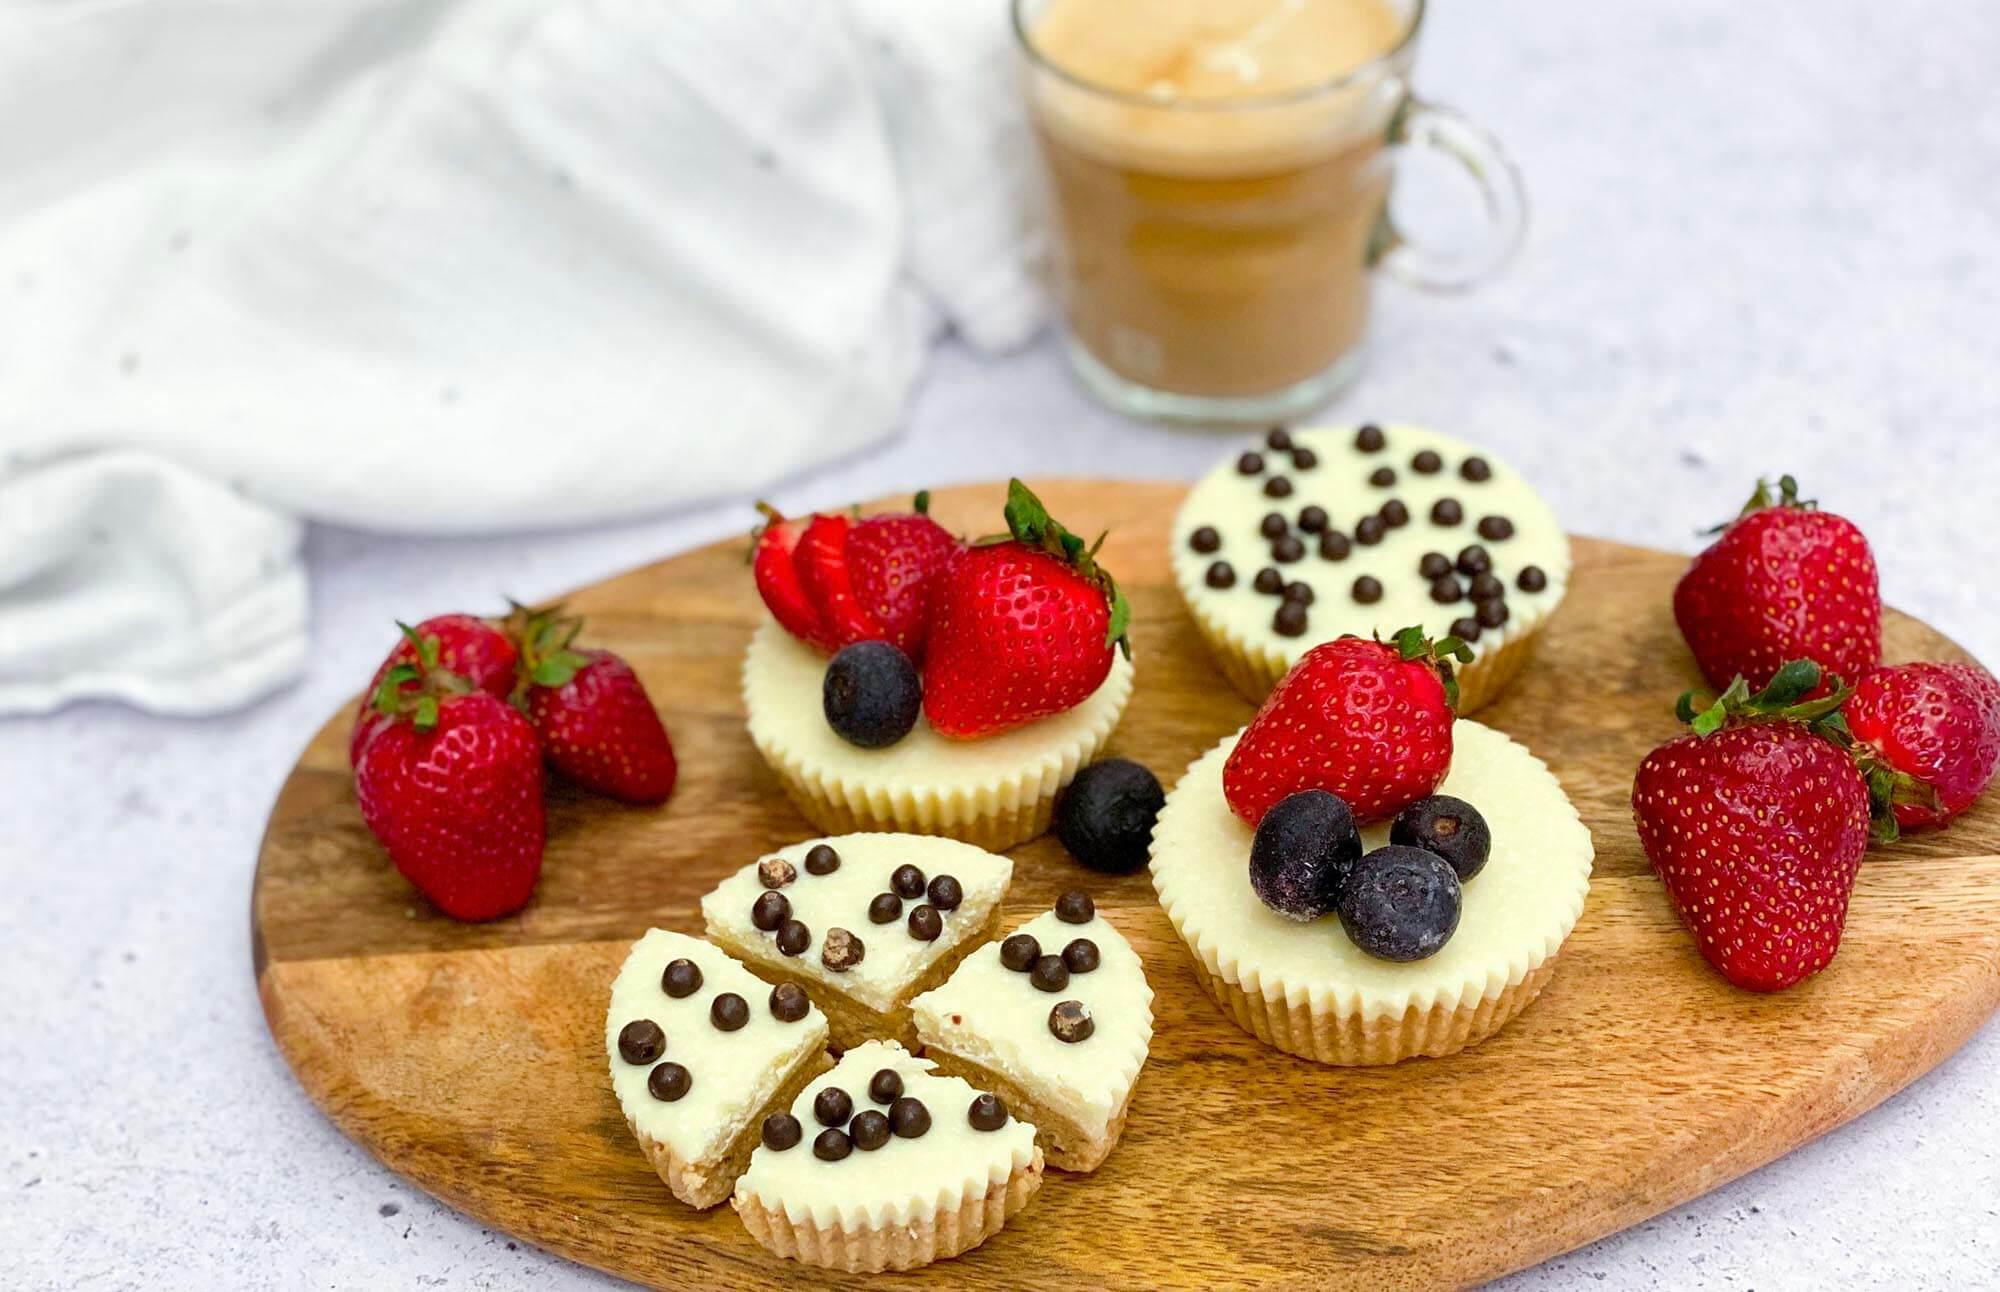 mini torte, klub zdravih navika, kzn, mini torte klub zdravih navika, mini torte kzn, tortice, slatki zalogaji, slatke tortice, zdravi zalogaji, zdravi recepti, slatko, desert, Iceberg Salat Centar